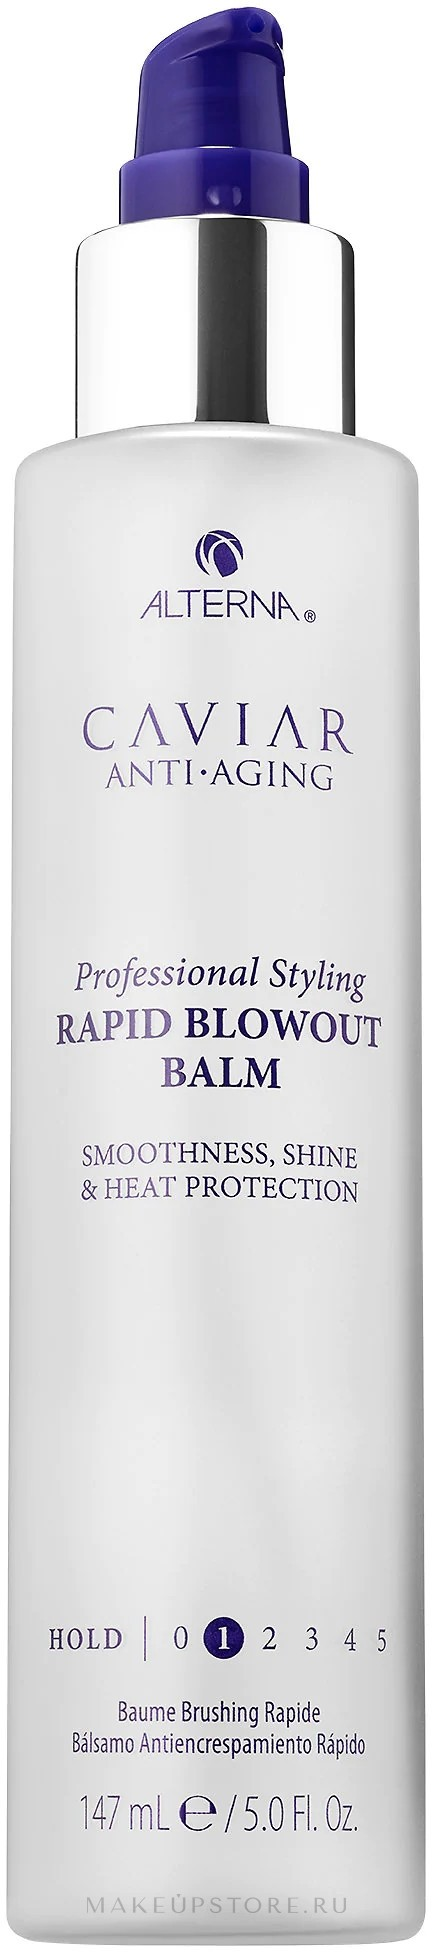 Бальзам для быстрого разглаживания волос Caviar Anti-Aging Professional Styling Rapid Blowout Balm Alterna USA 147 мл(р) — фото №1